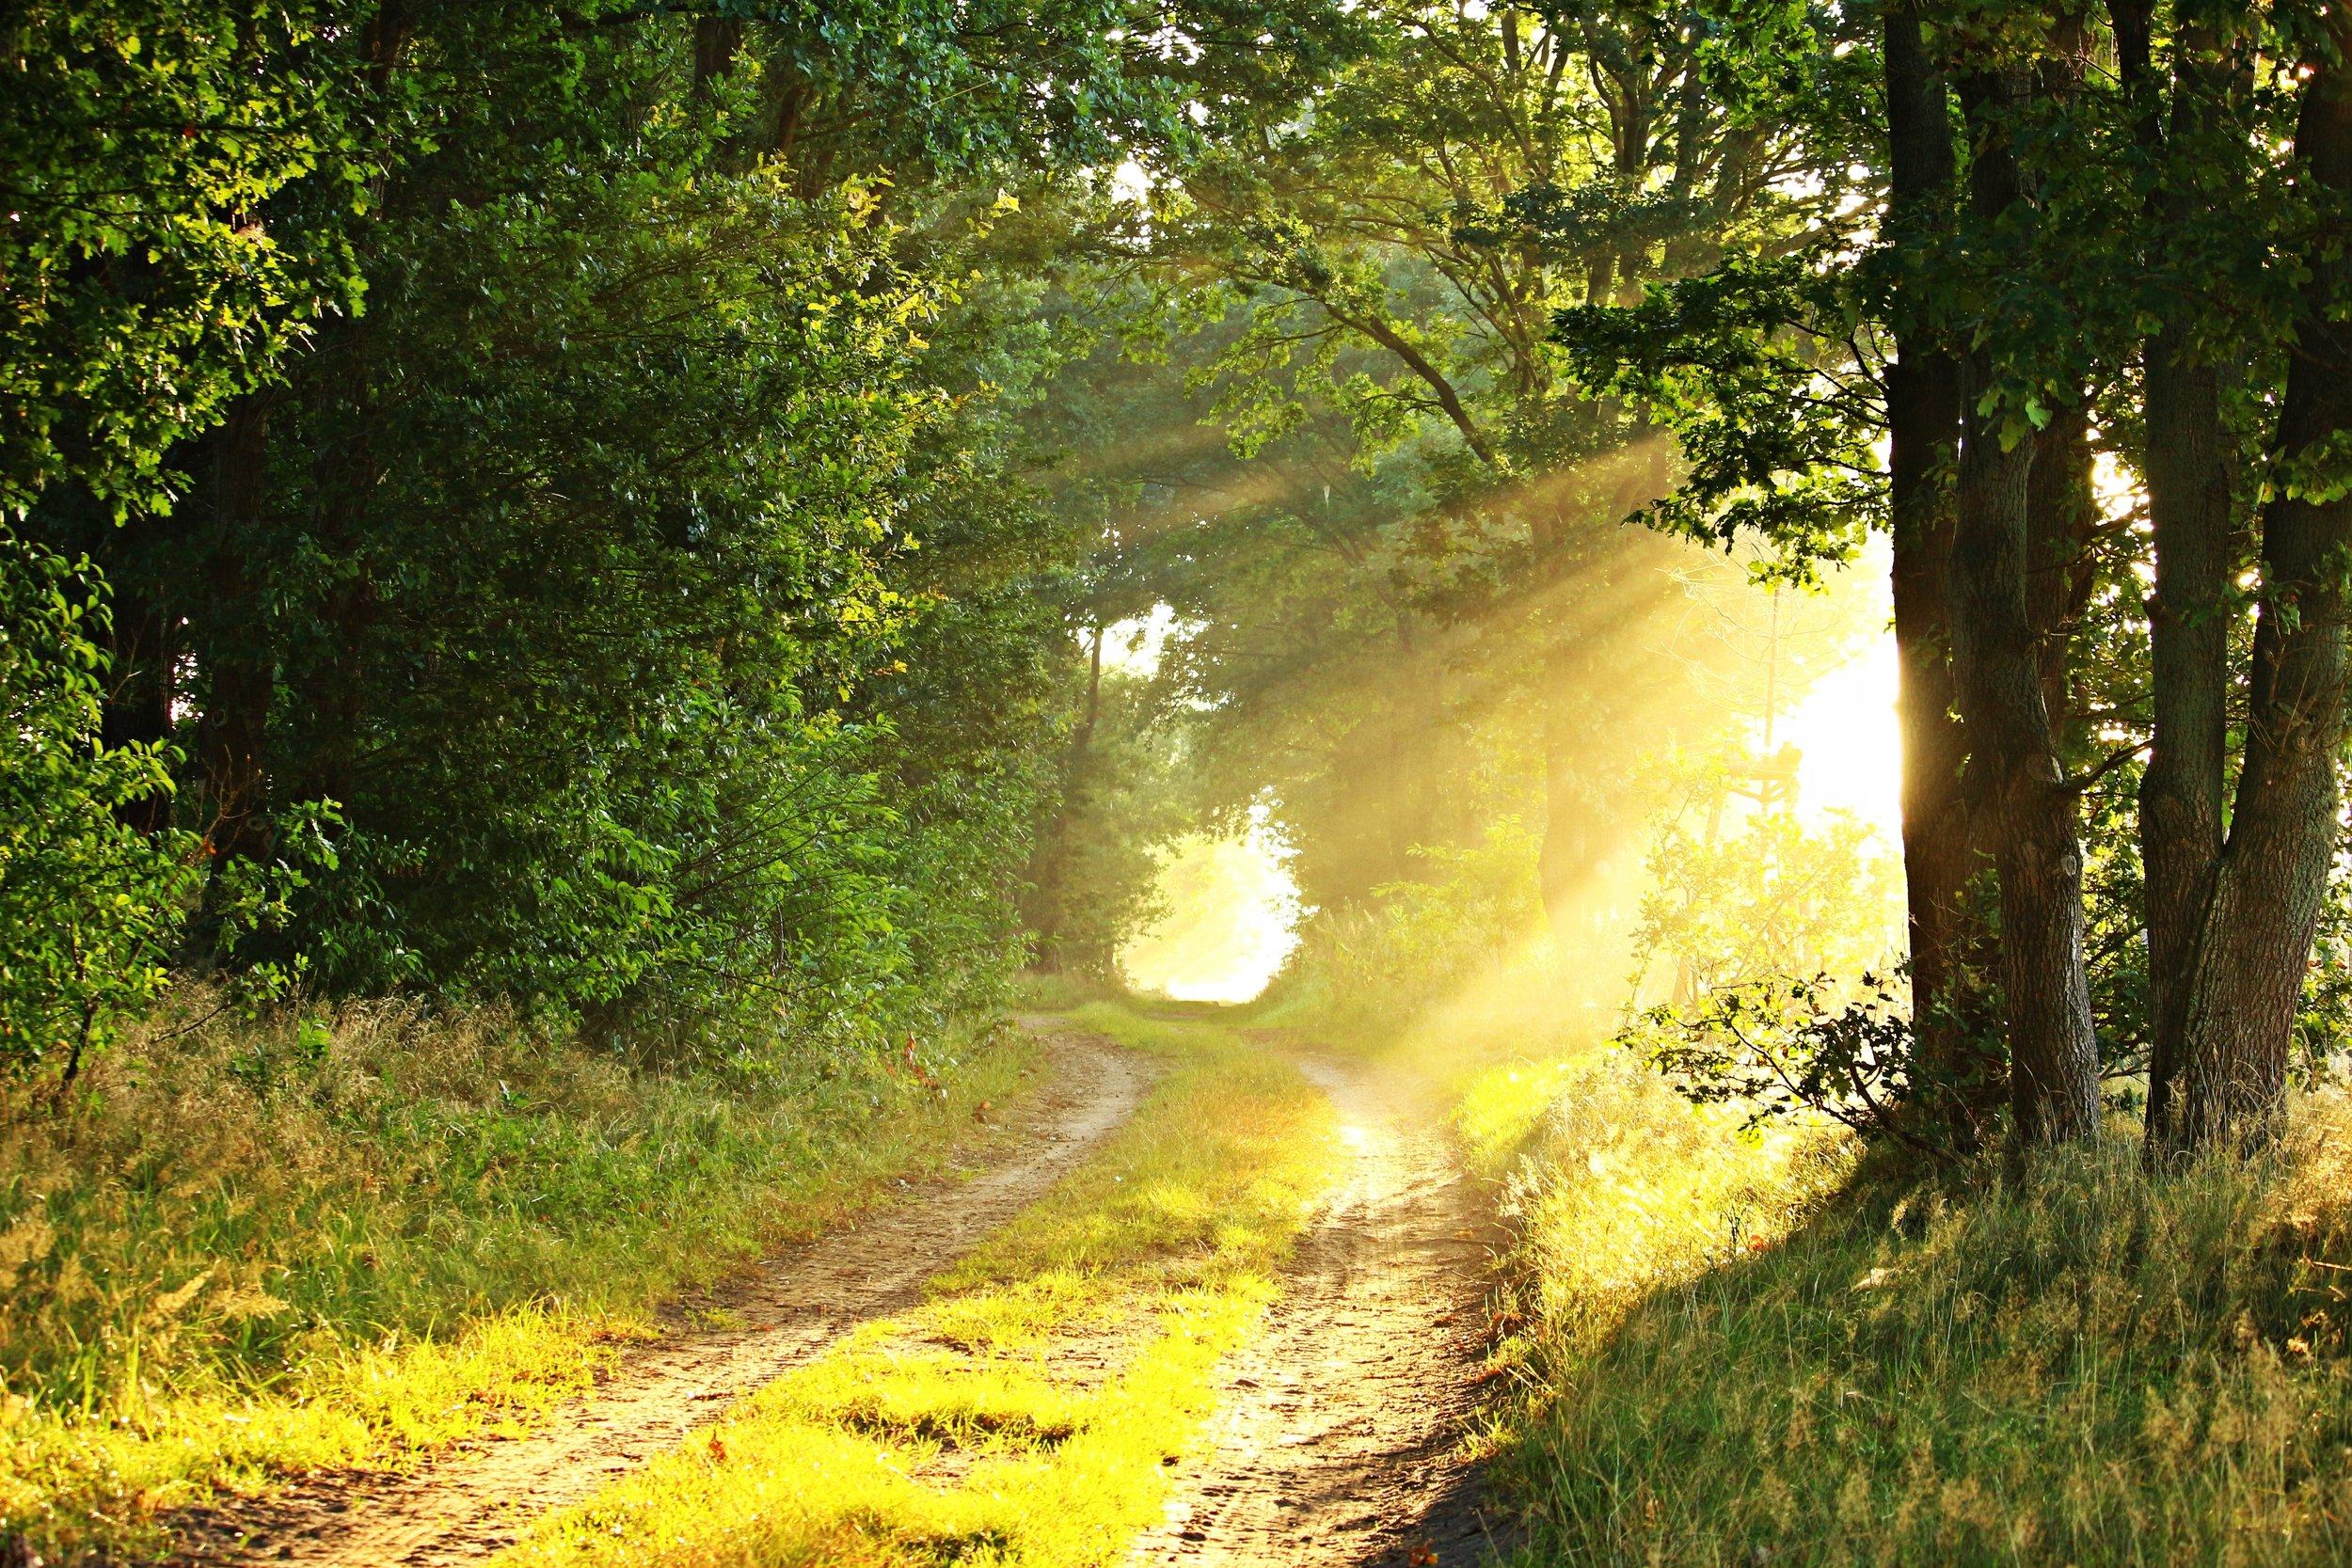 dirt-road-environment-foggy-209756.jpg